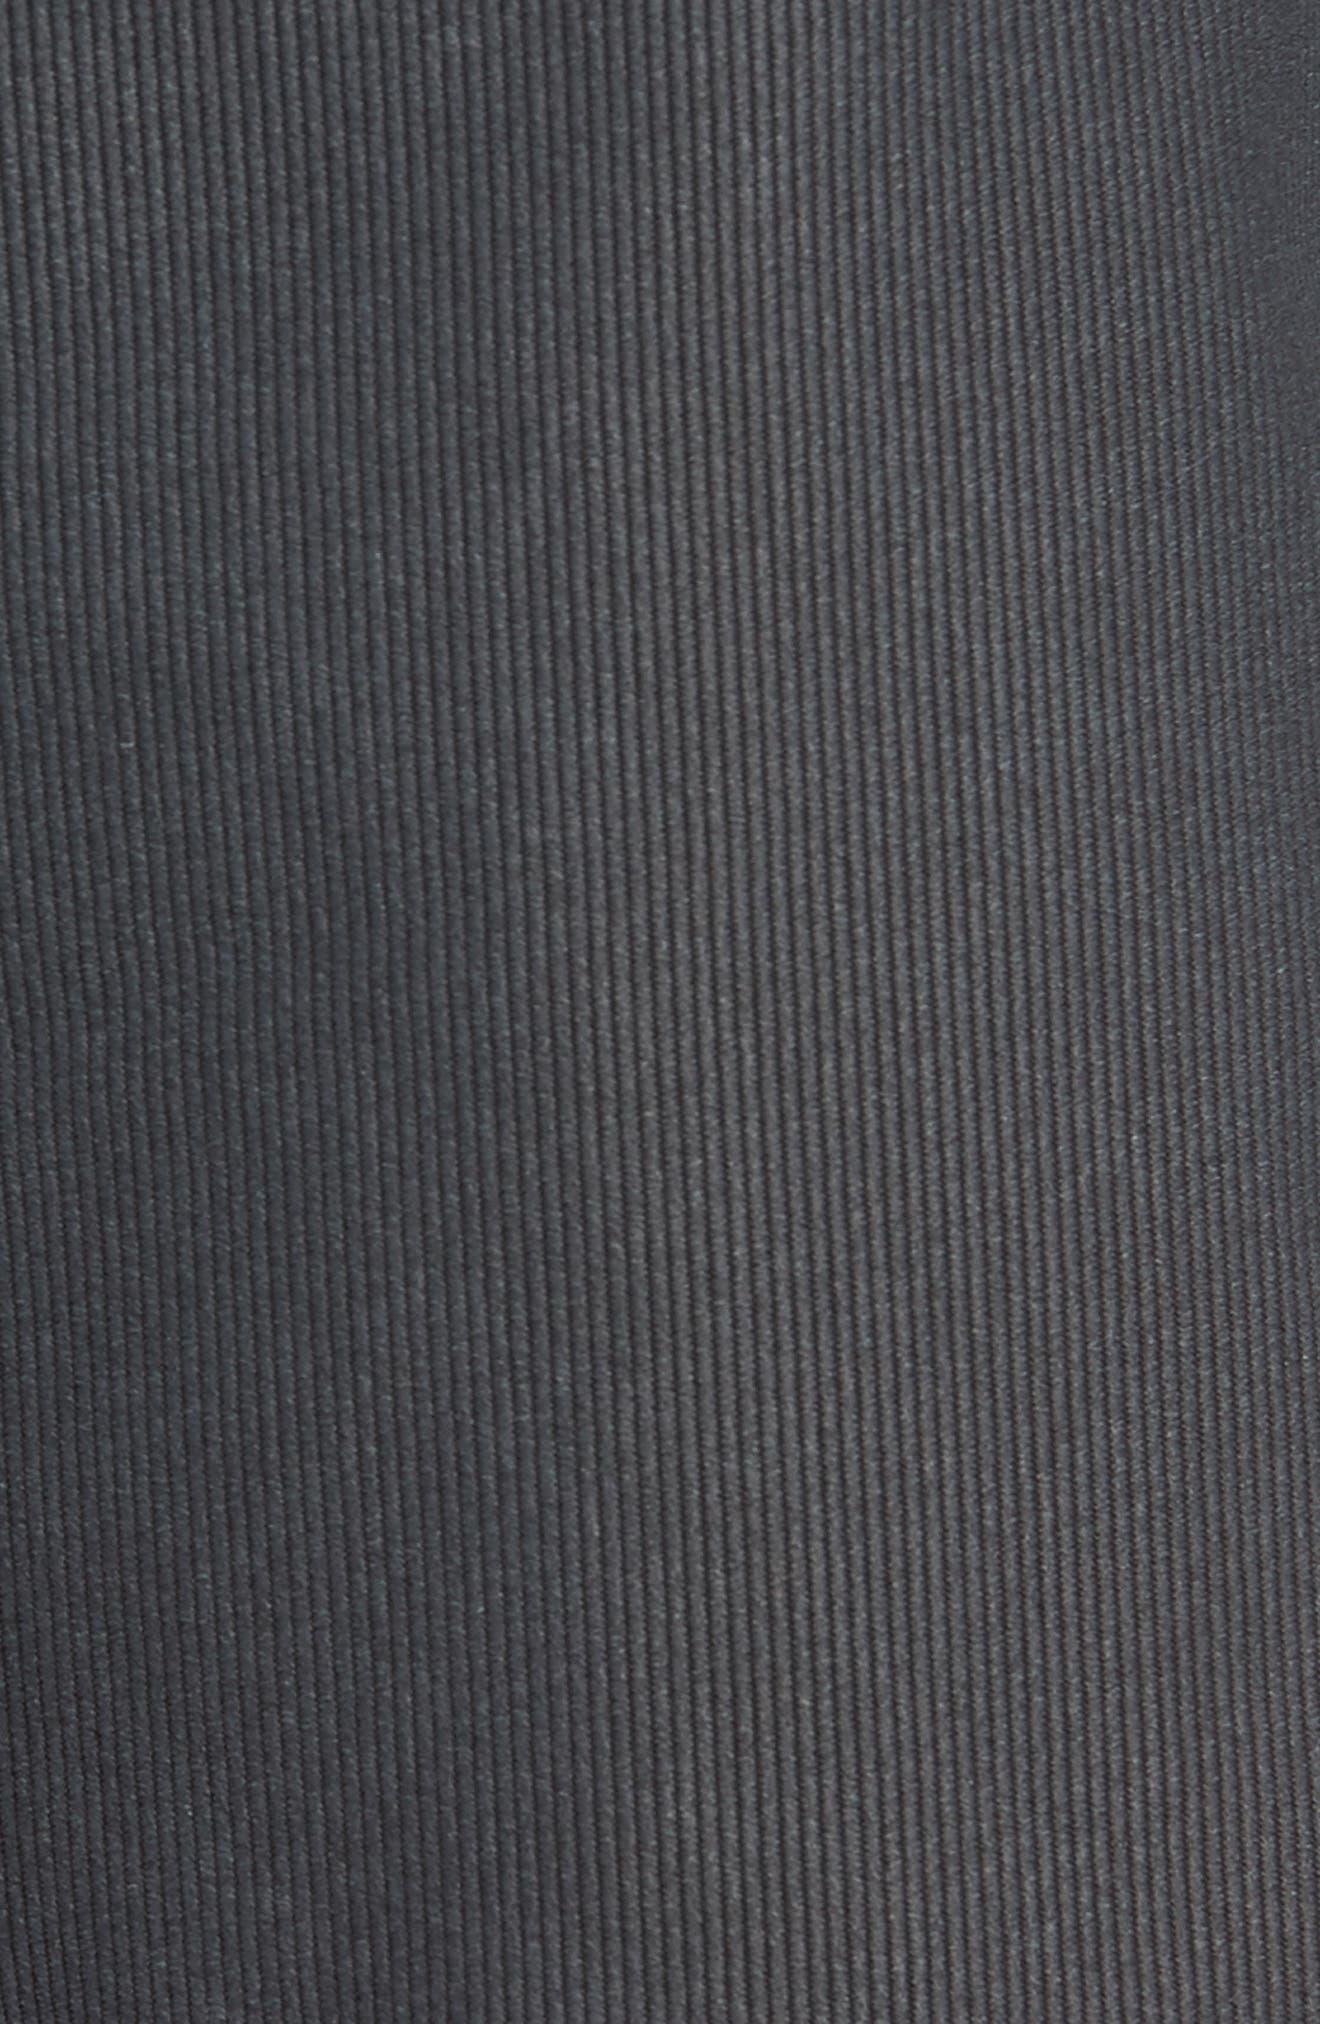 Outsider X Surf Corduroy Shorts,                             Alternate thumbnail 4, color,                             Black